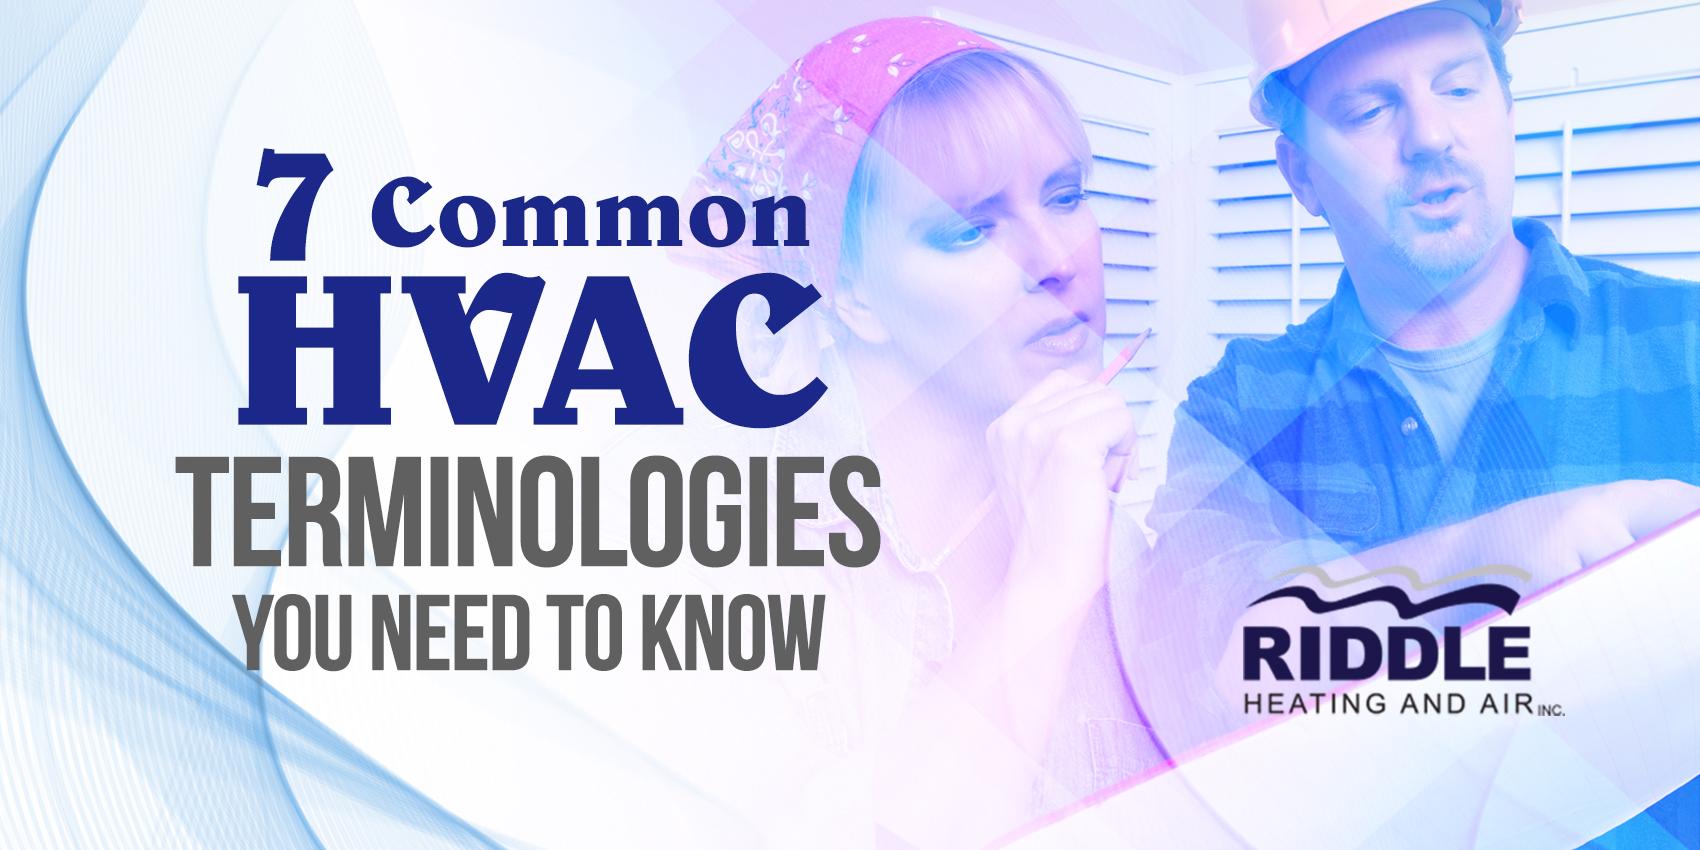 7 Common HVAC Terminologies You Need To Know